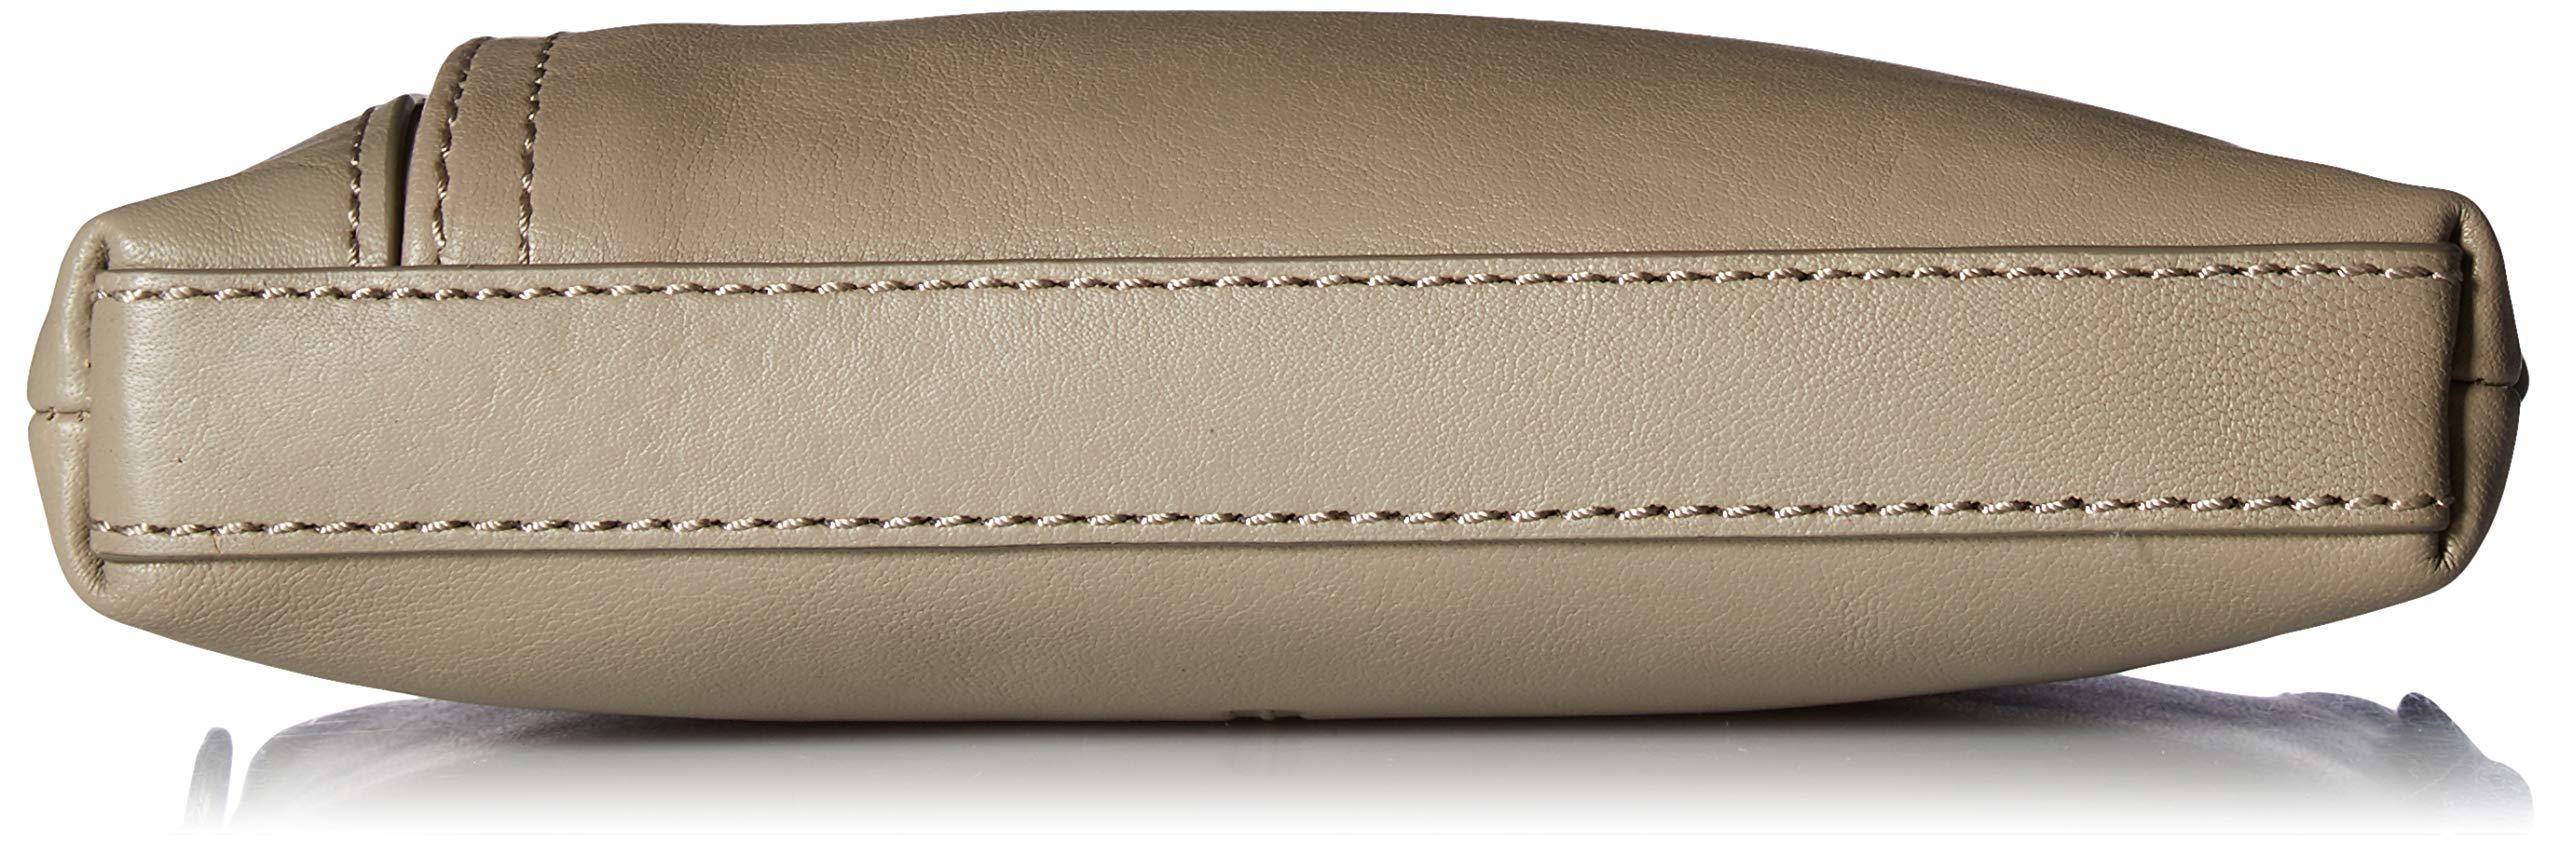 FRYE Lena Zip Leather Crossbody Wristlet Bag, grey by FRYE (Image #4)